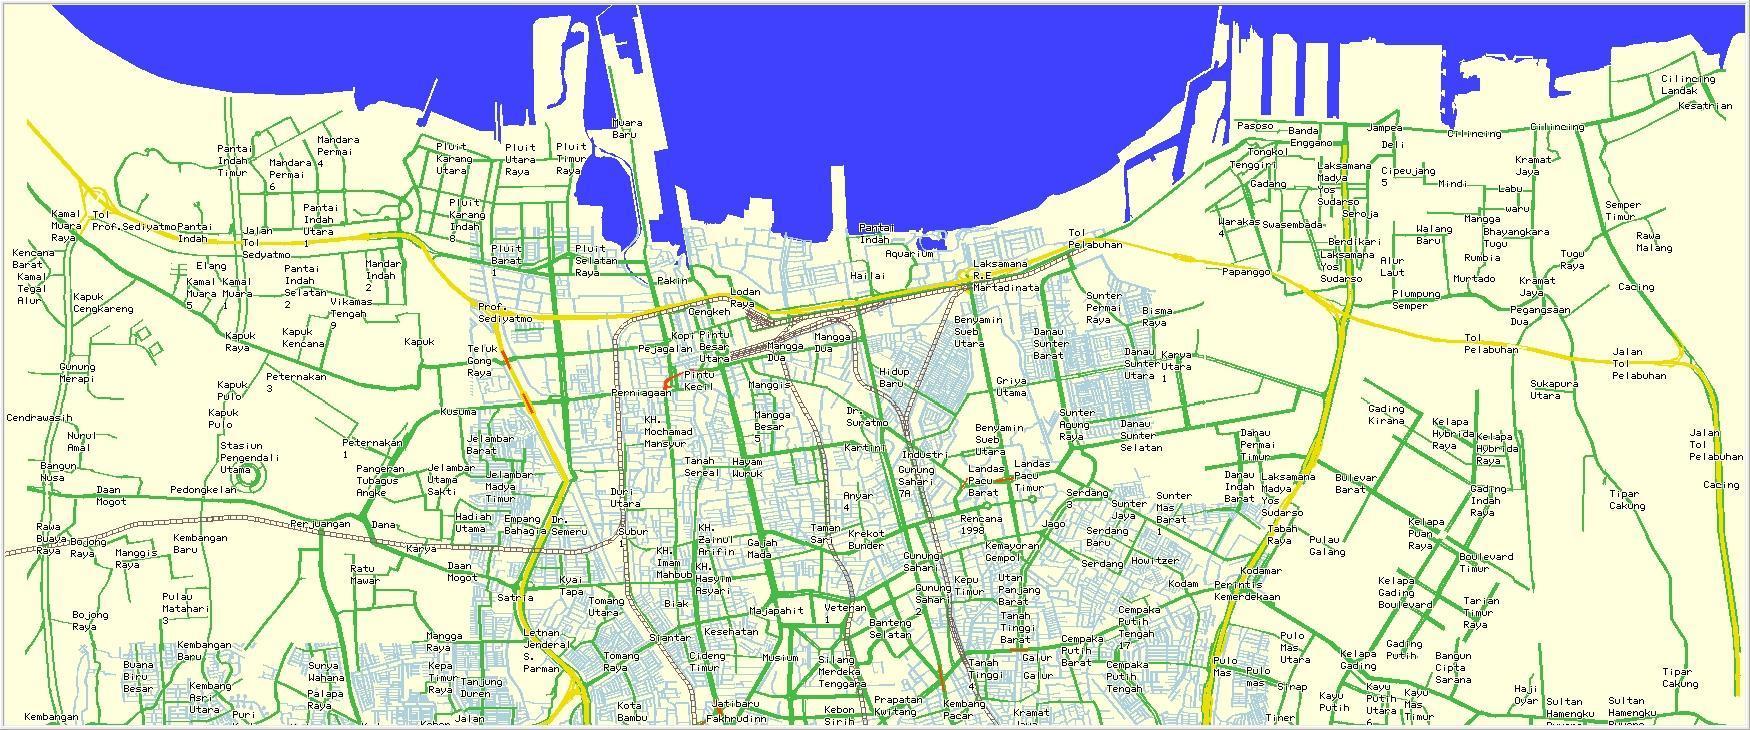 Jakarta map - Peta Jakarta utara (Jawa - Indonesia)